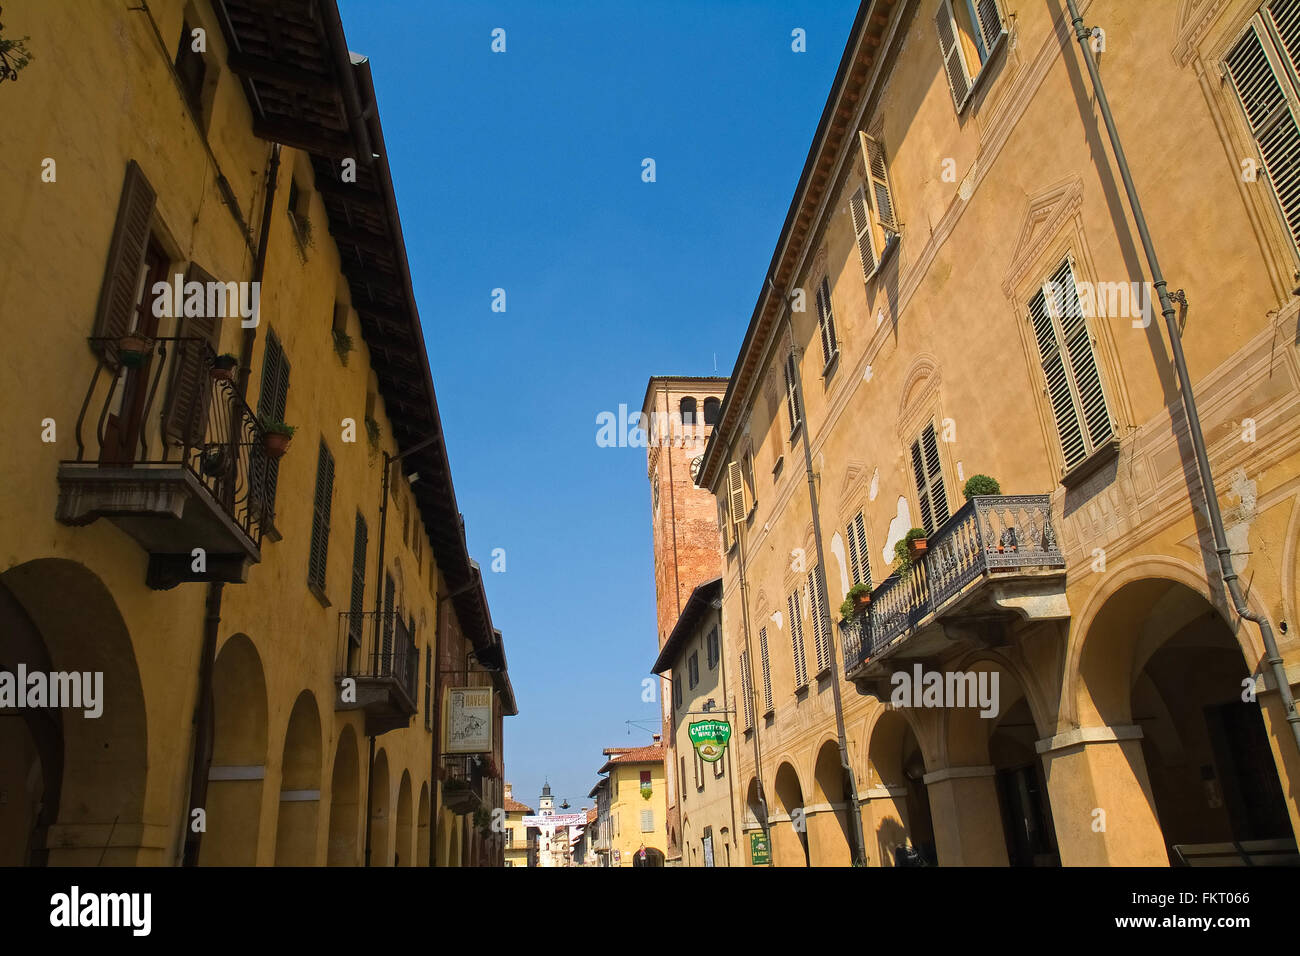 Piedmont Cherasco Via Cavour and Civic Tower - Stock Image